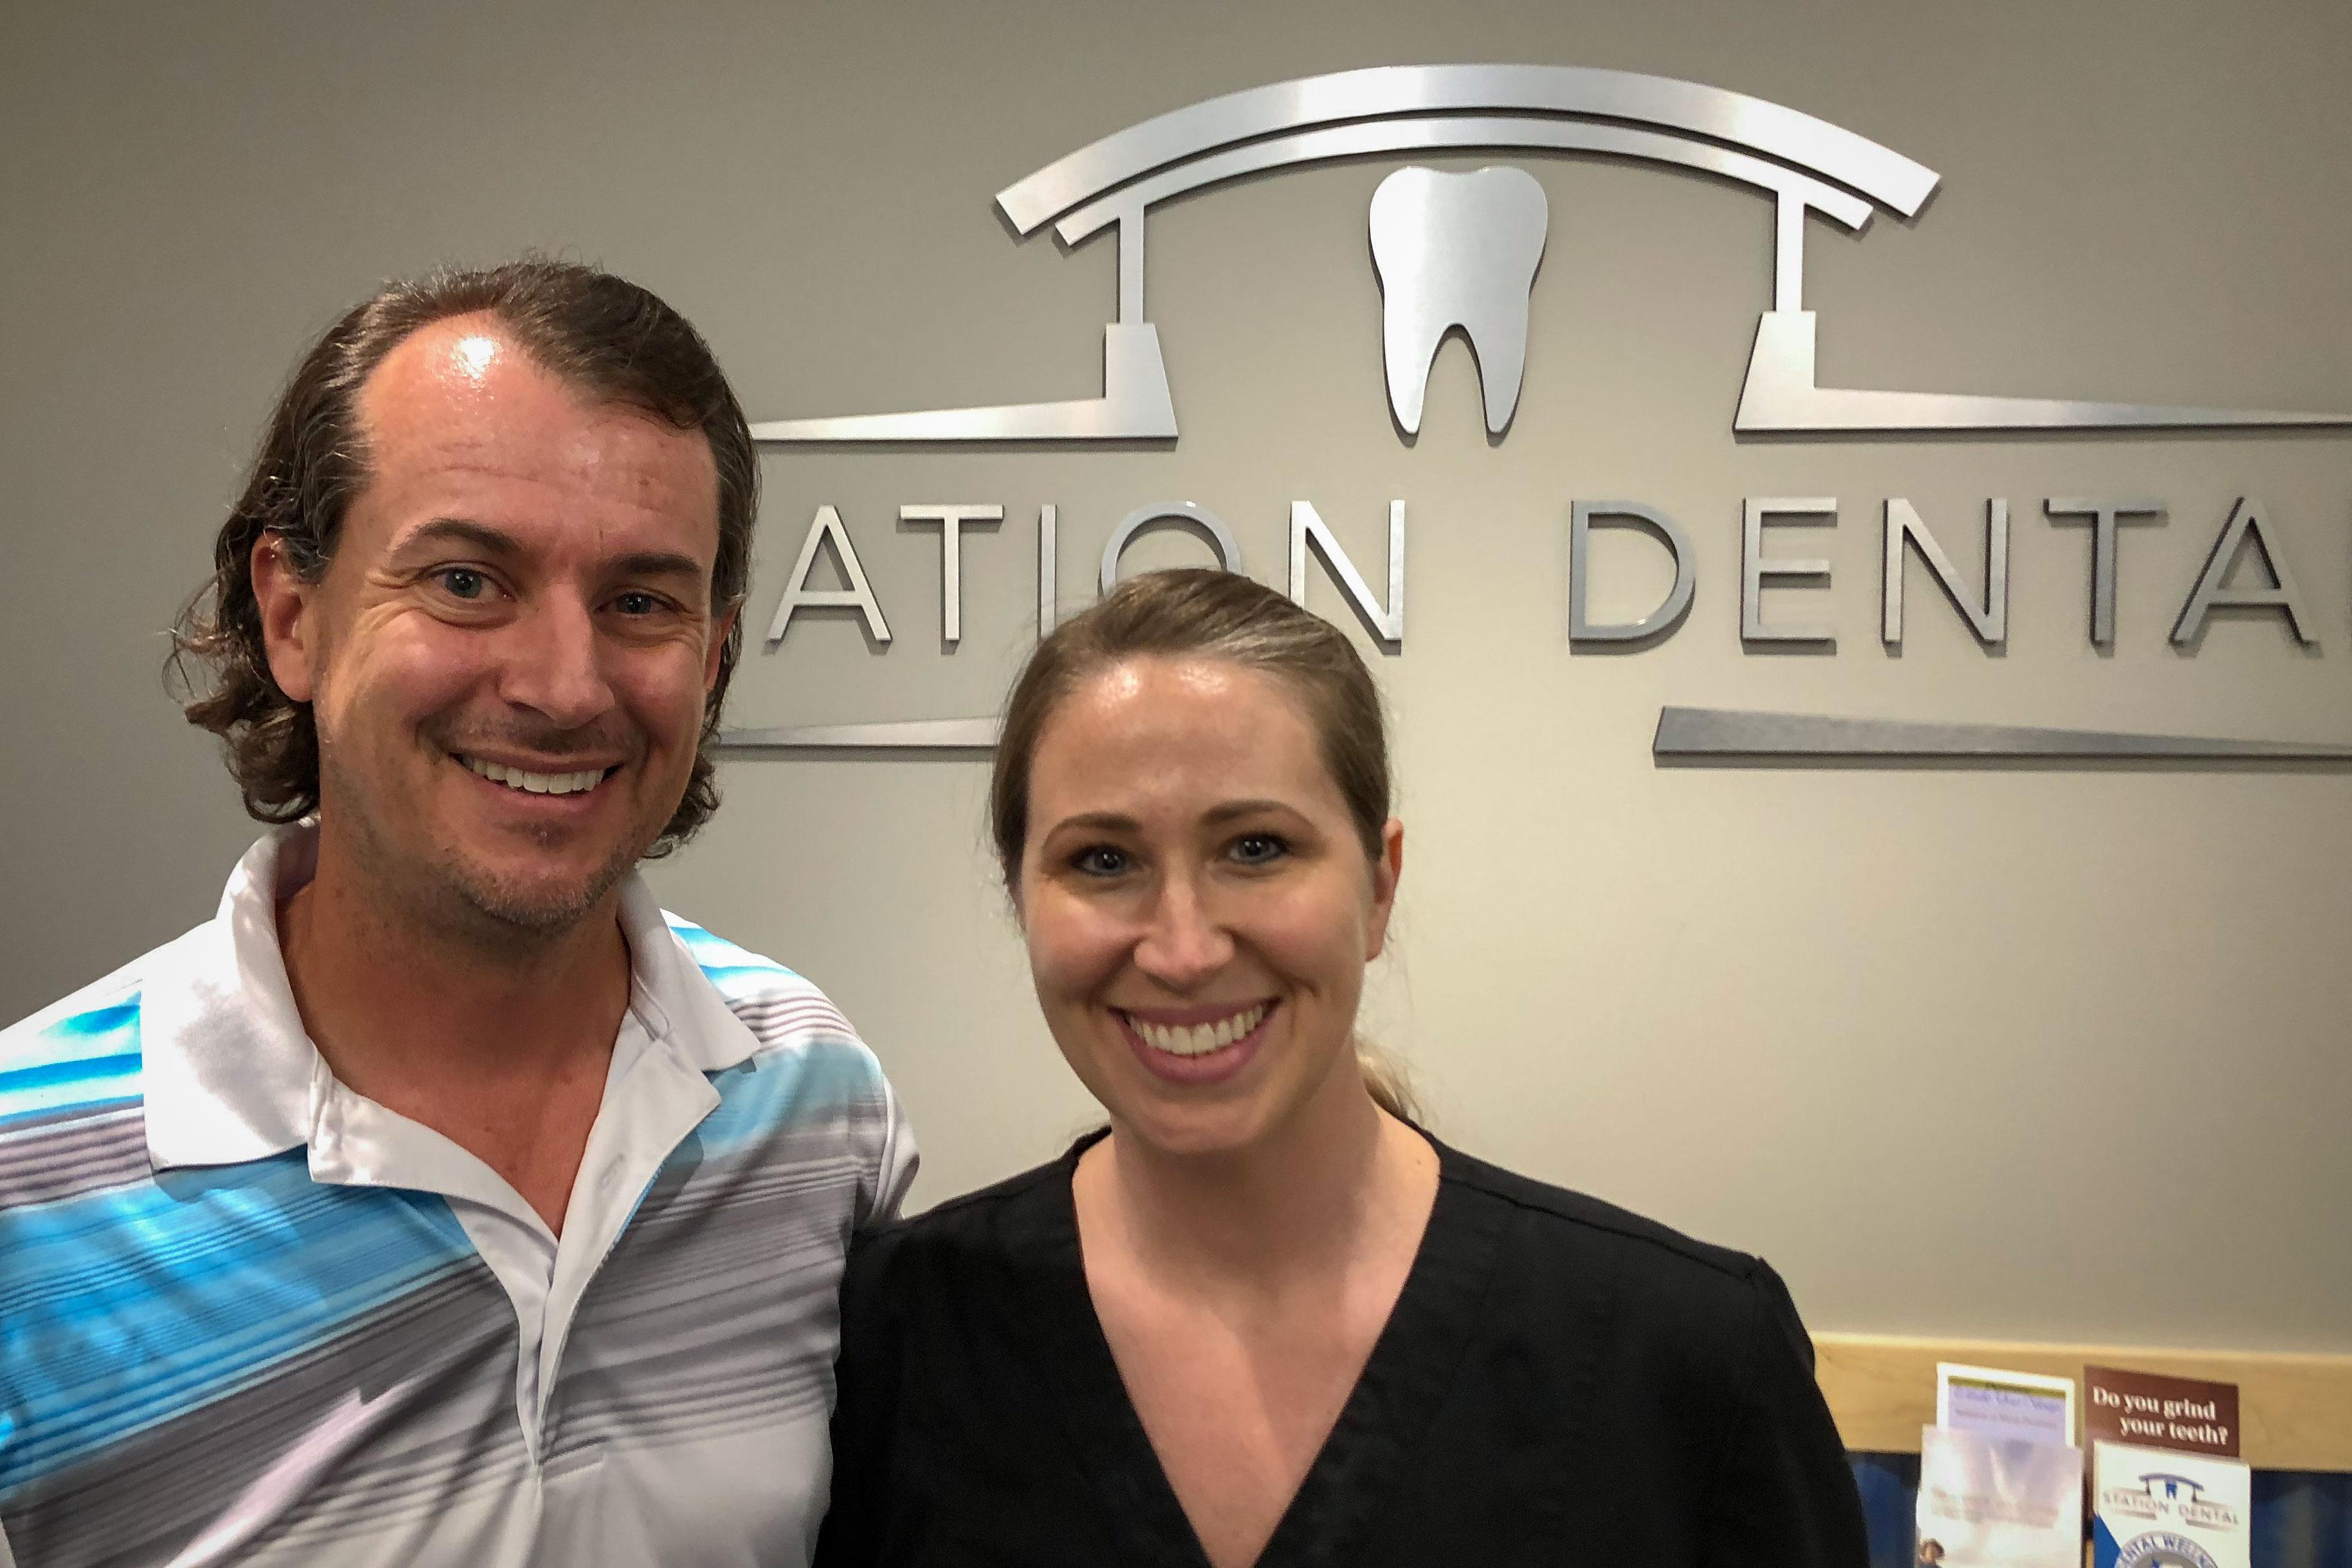 Photo: Workforce Trouble 2 | Dentists - BMarkus